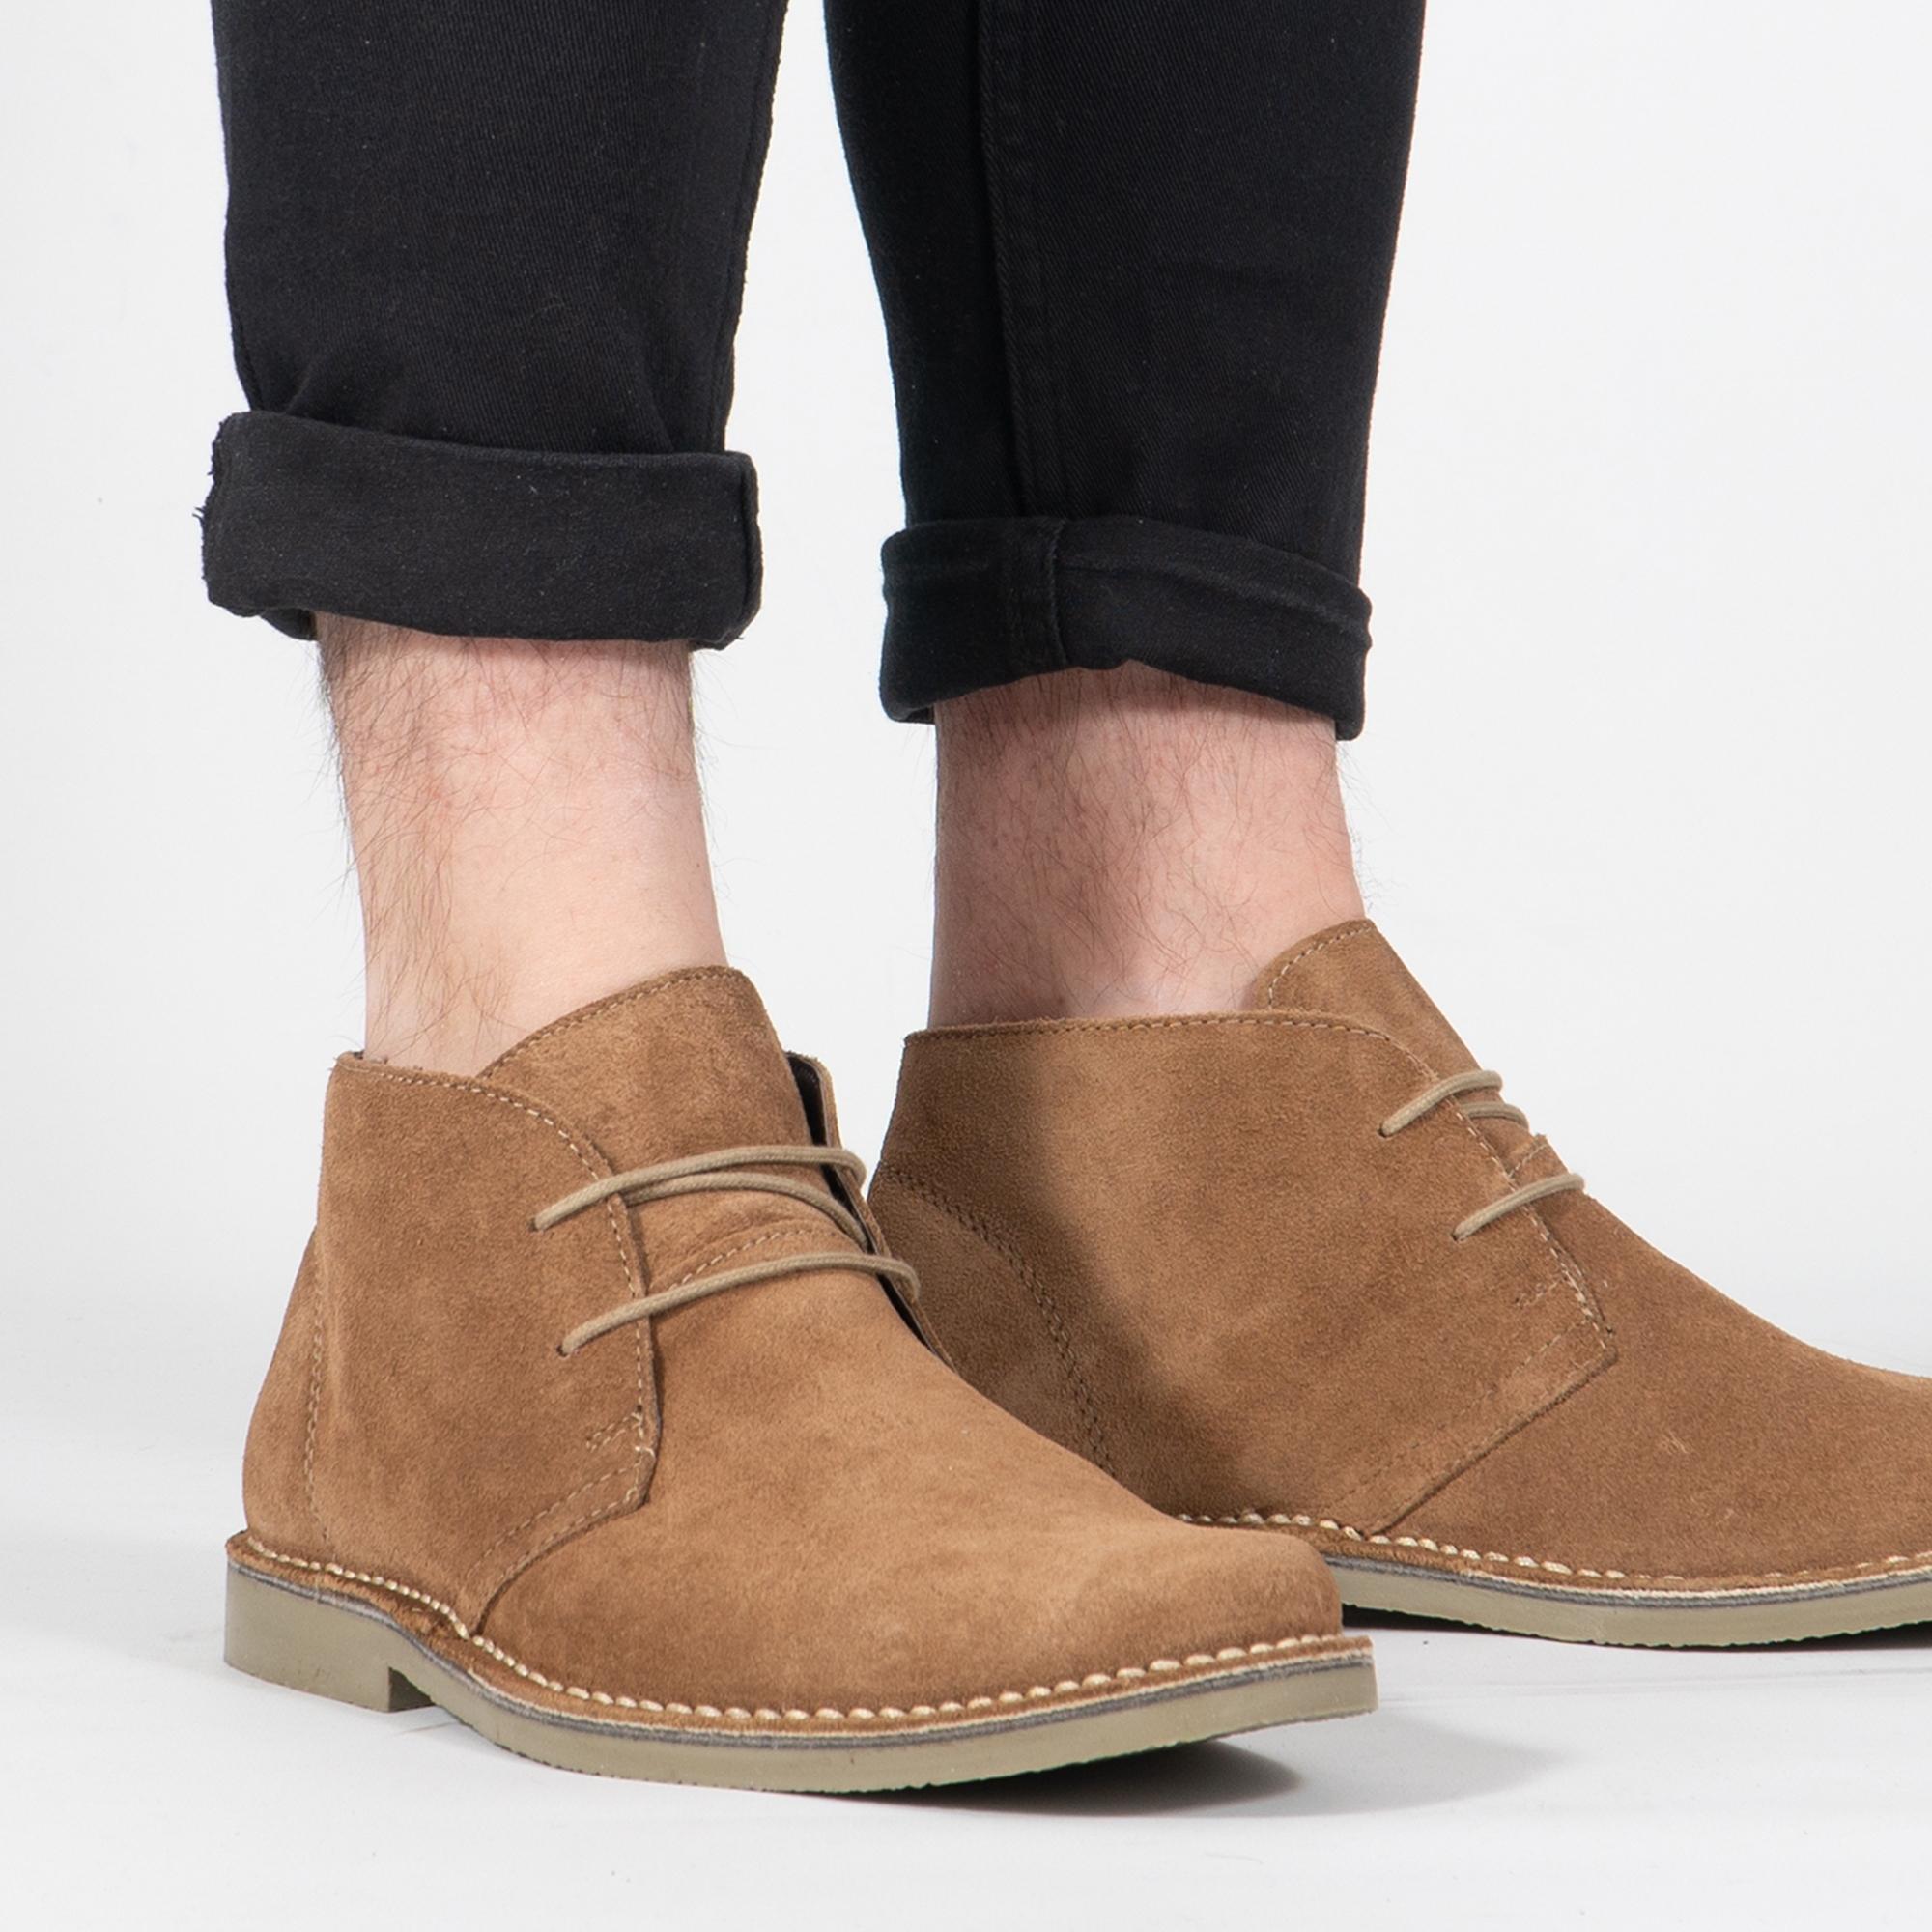 Roamers JIM Mens Sand Desert Boots